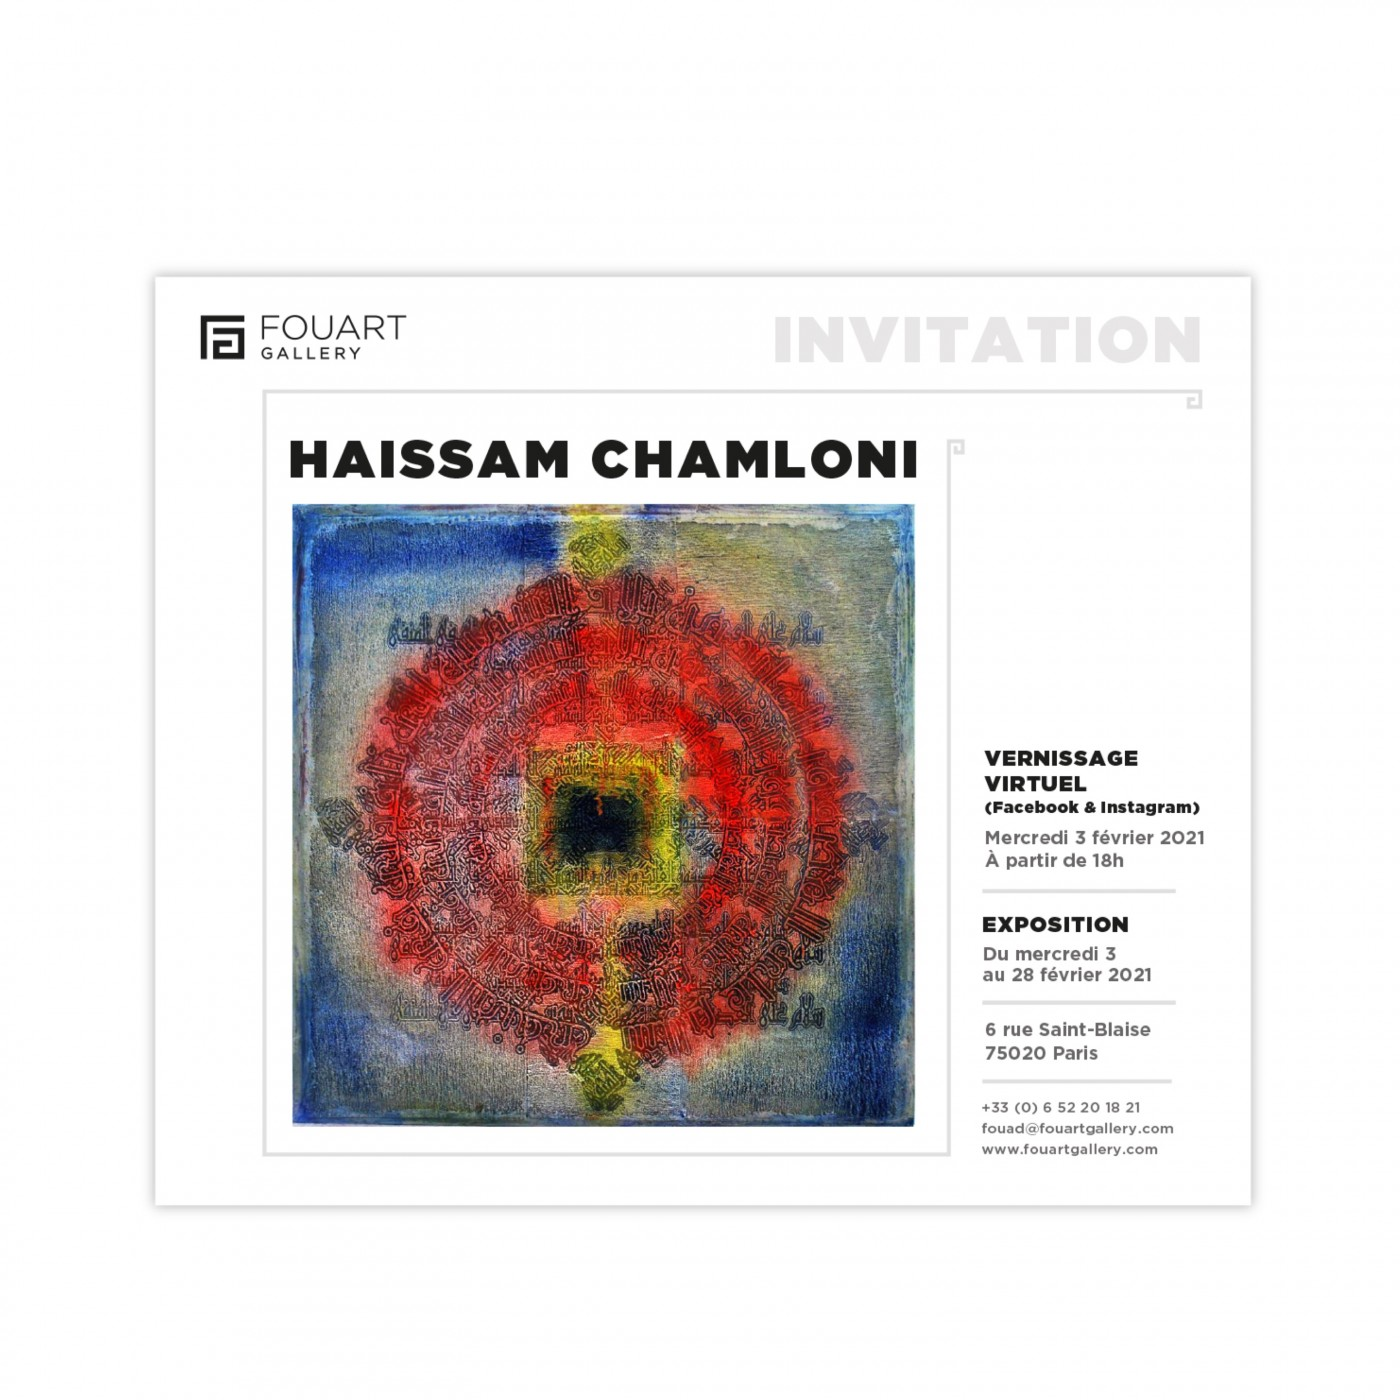 Exhibition Haissam Chamloni